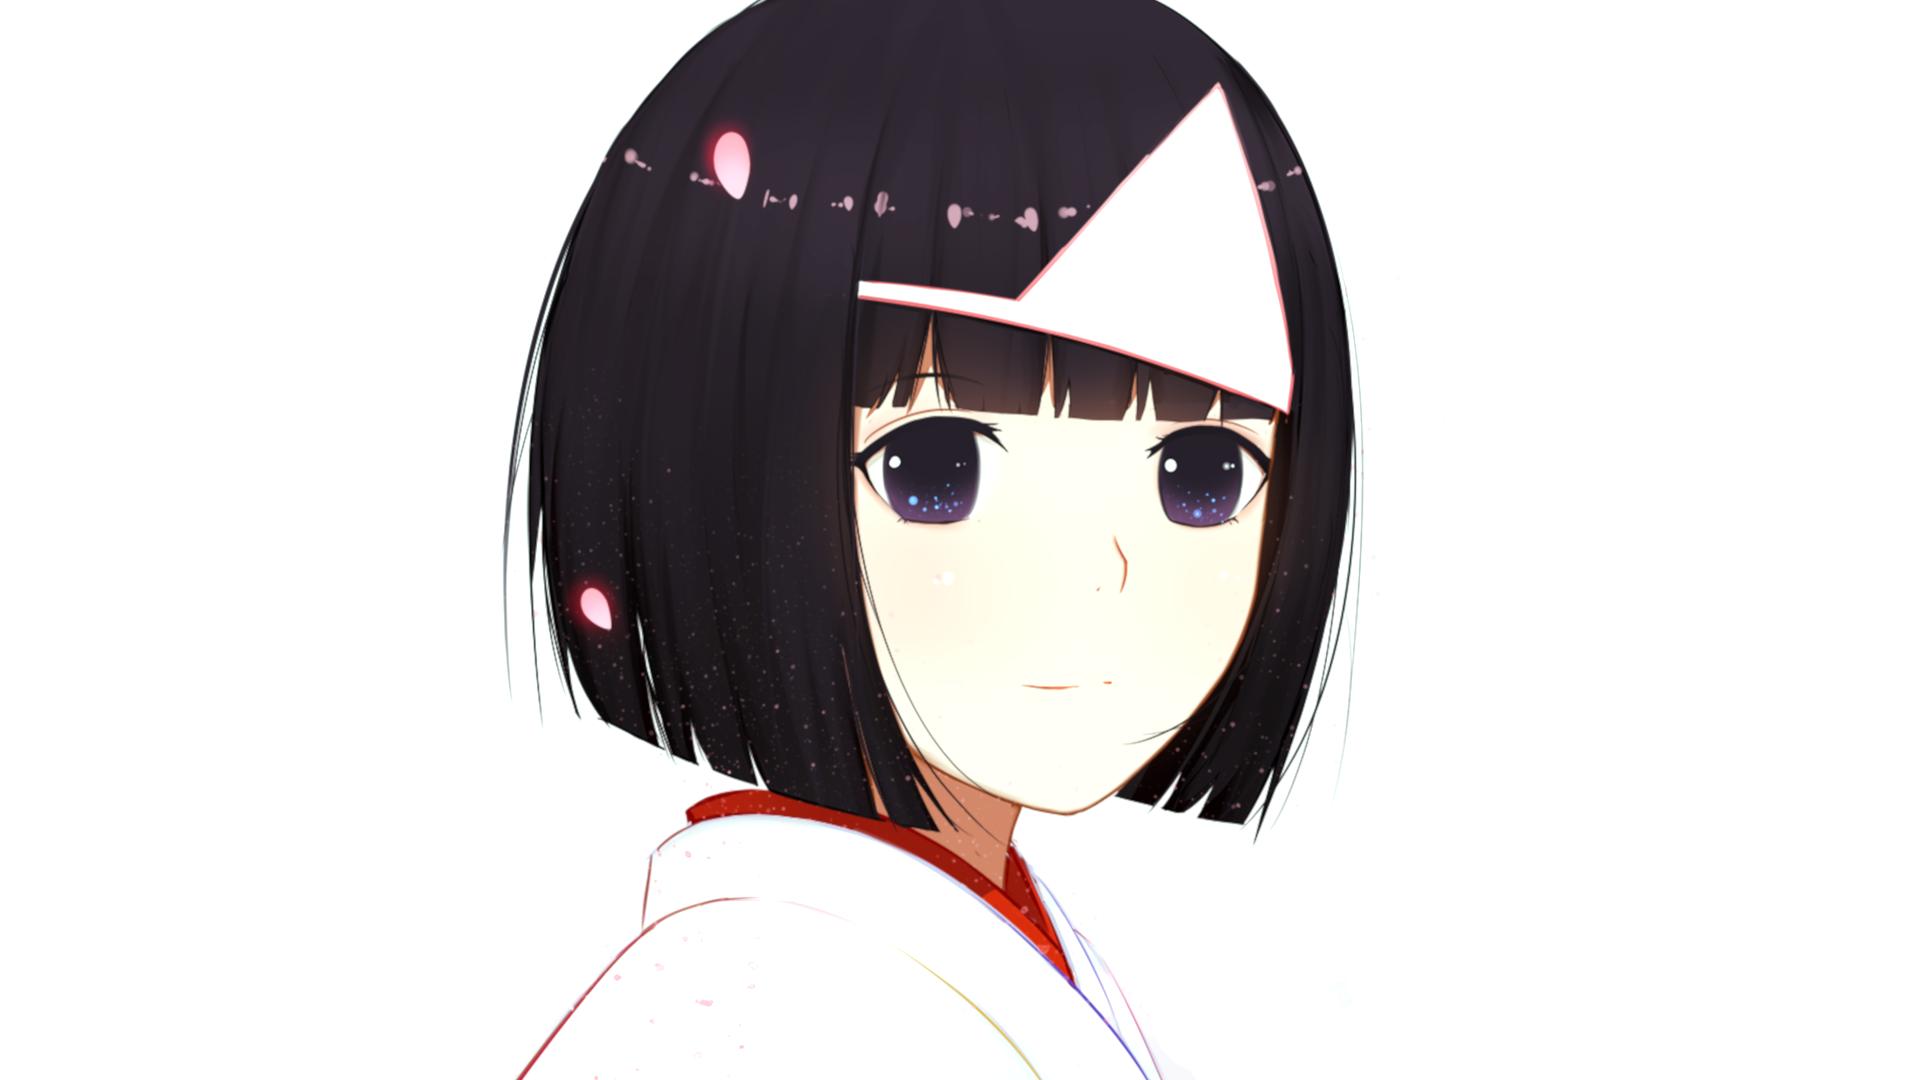 Anime Original Noragami Hiiro Wallpaper Anime Personagens